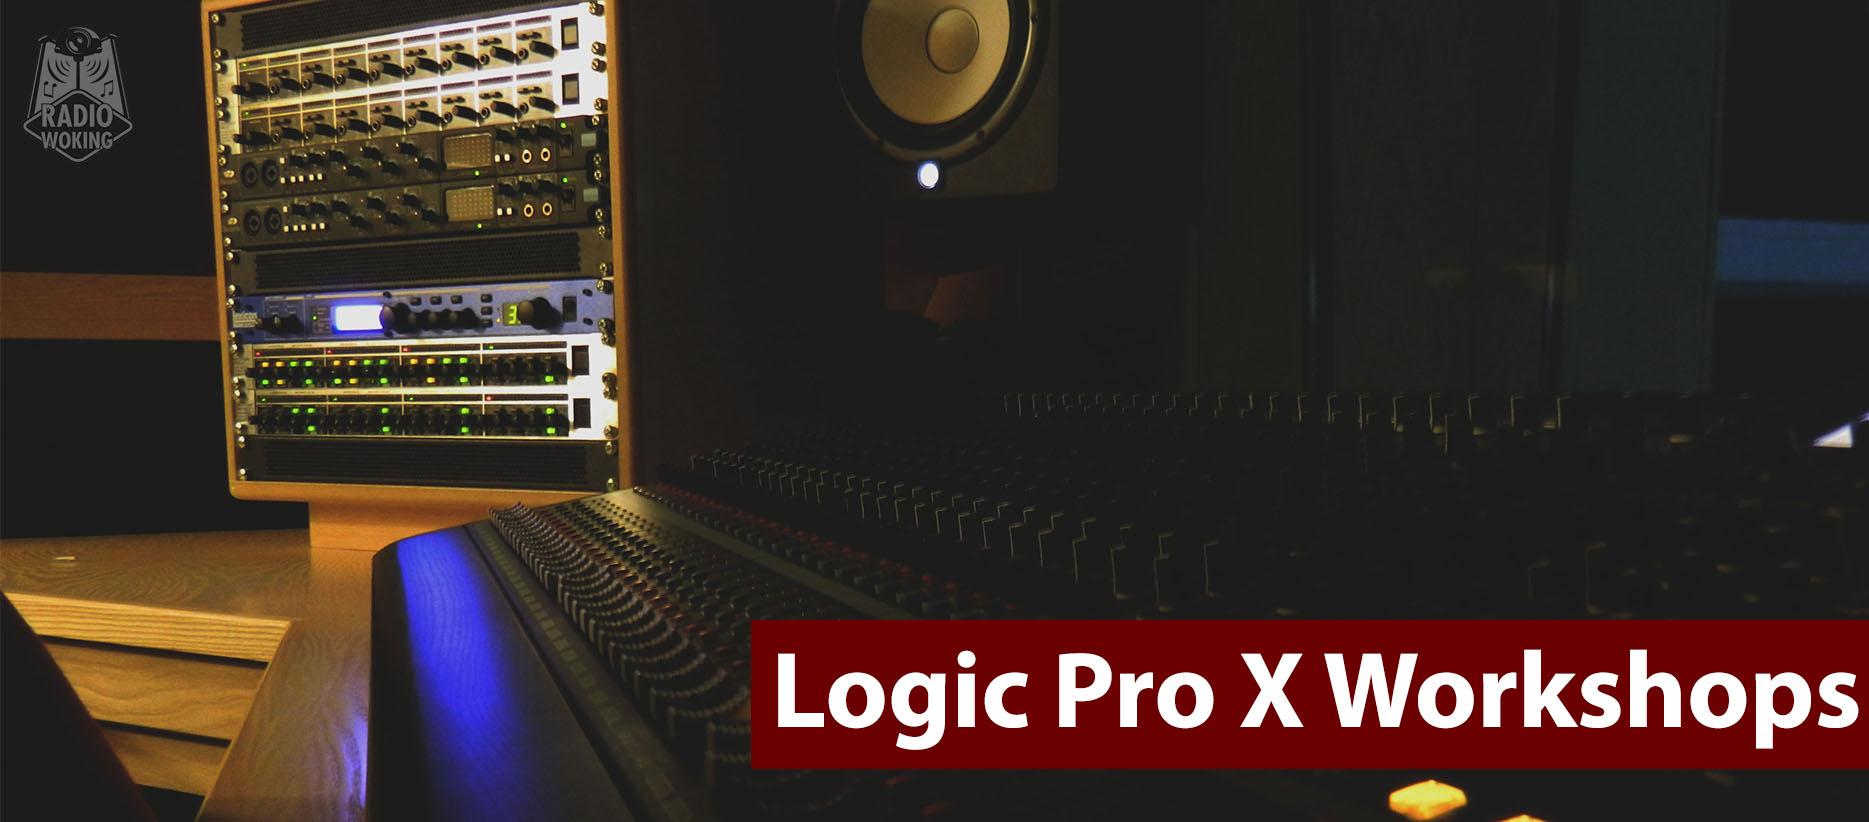 Logic Pro X Workshops